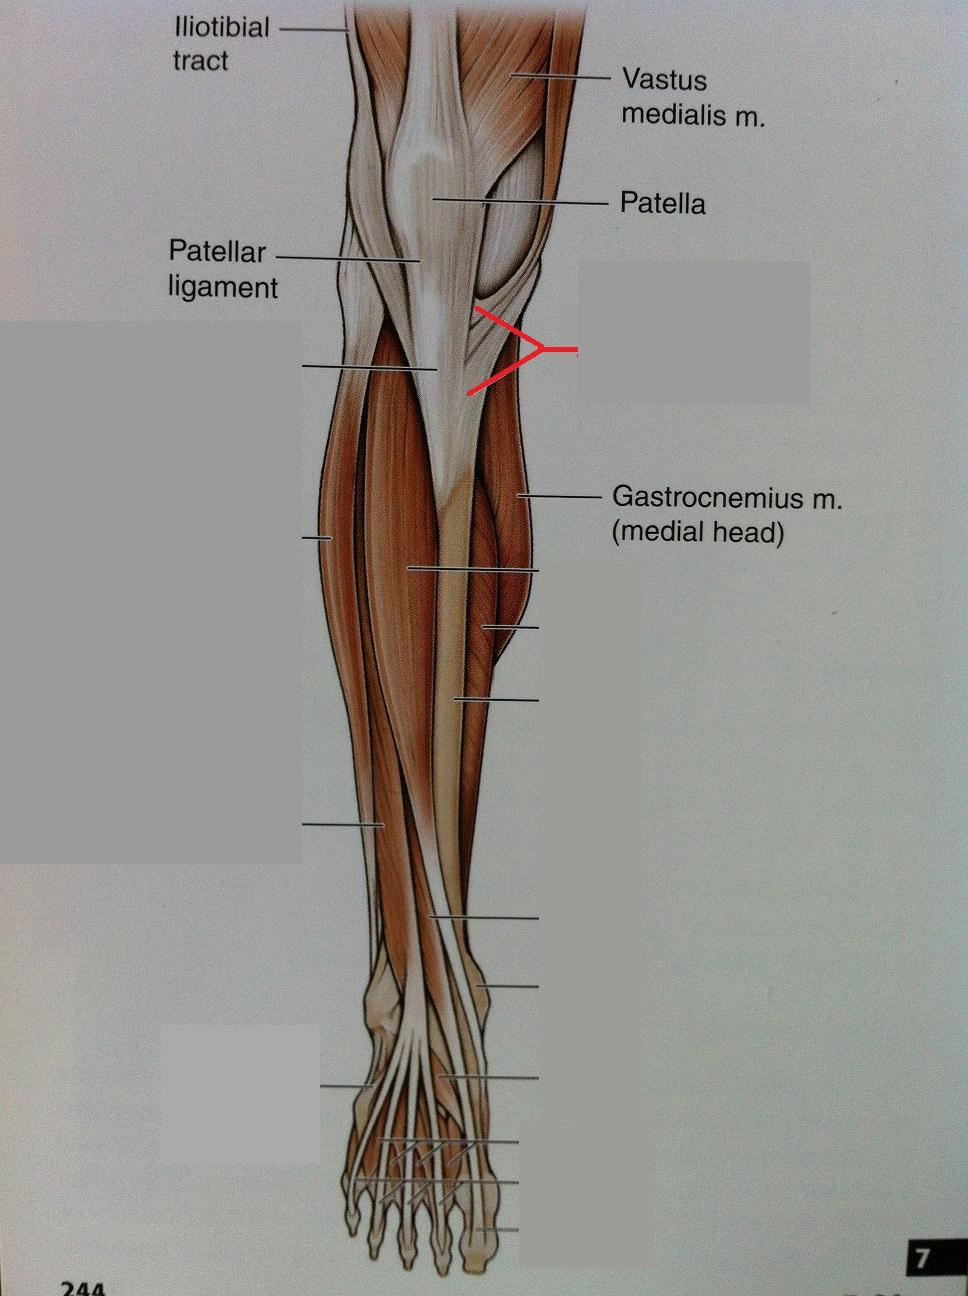 Pes anserine anatomy